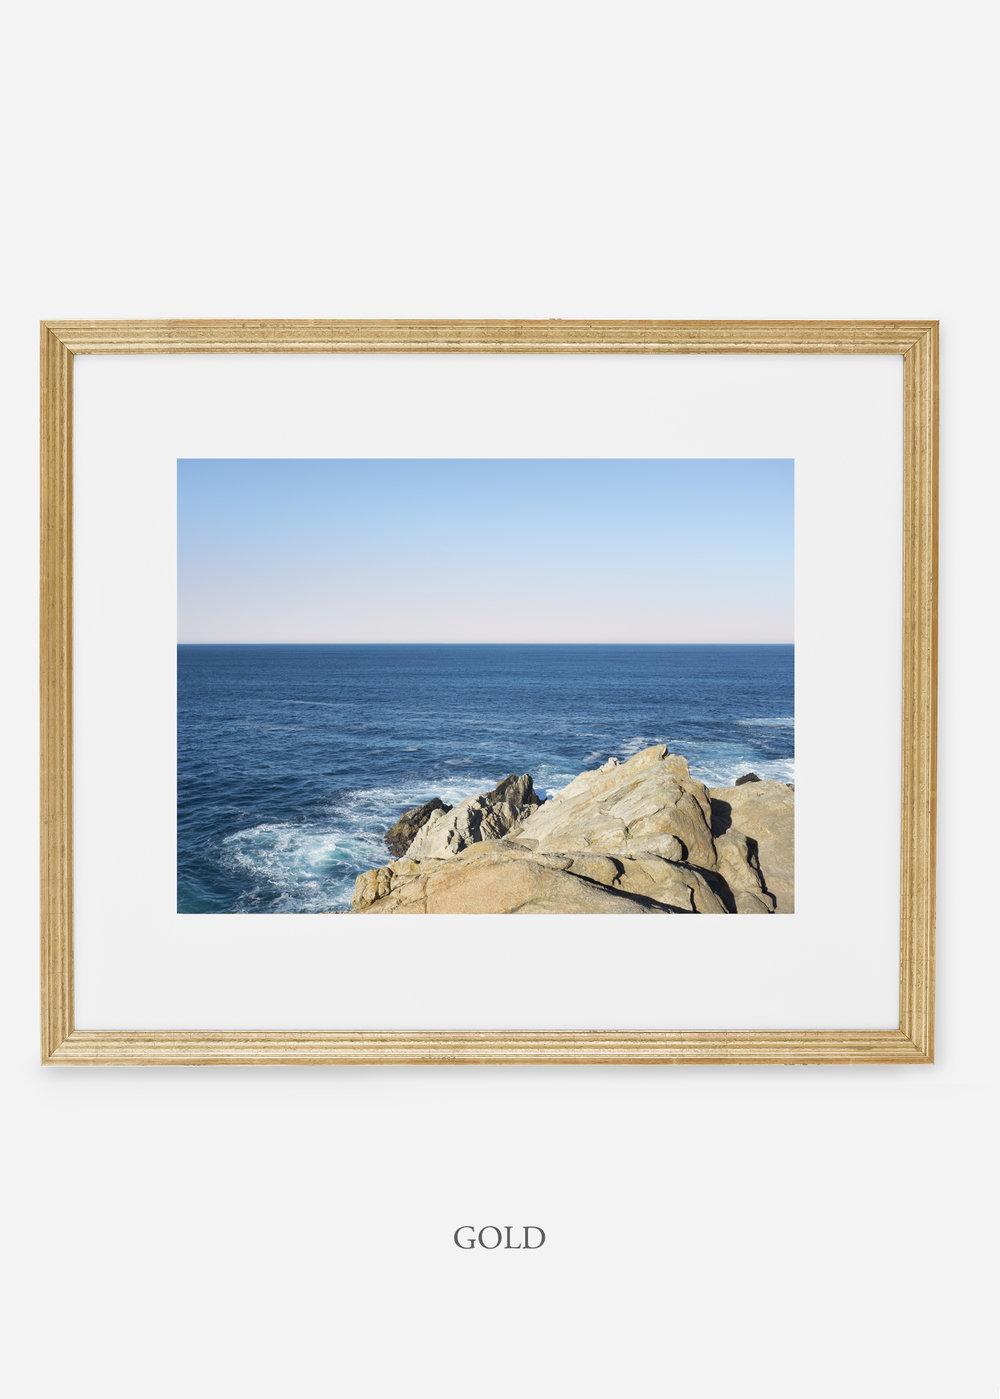 WilderCalifornia_goldframe_interiordesign_oceanprint_PacificOceanNo.2.jpg